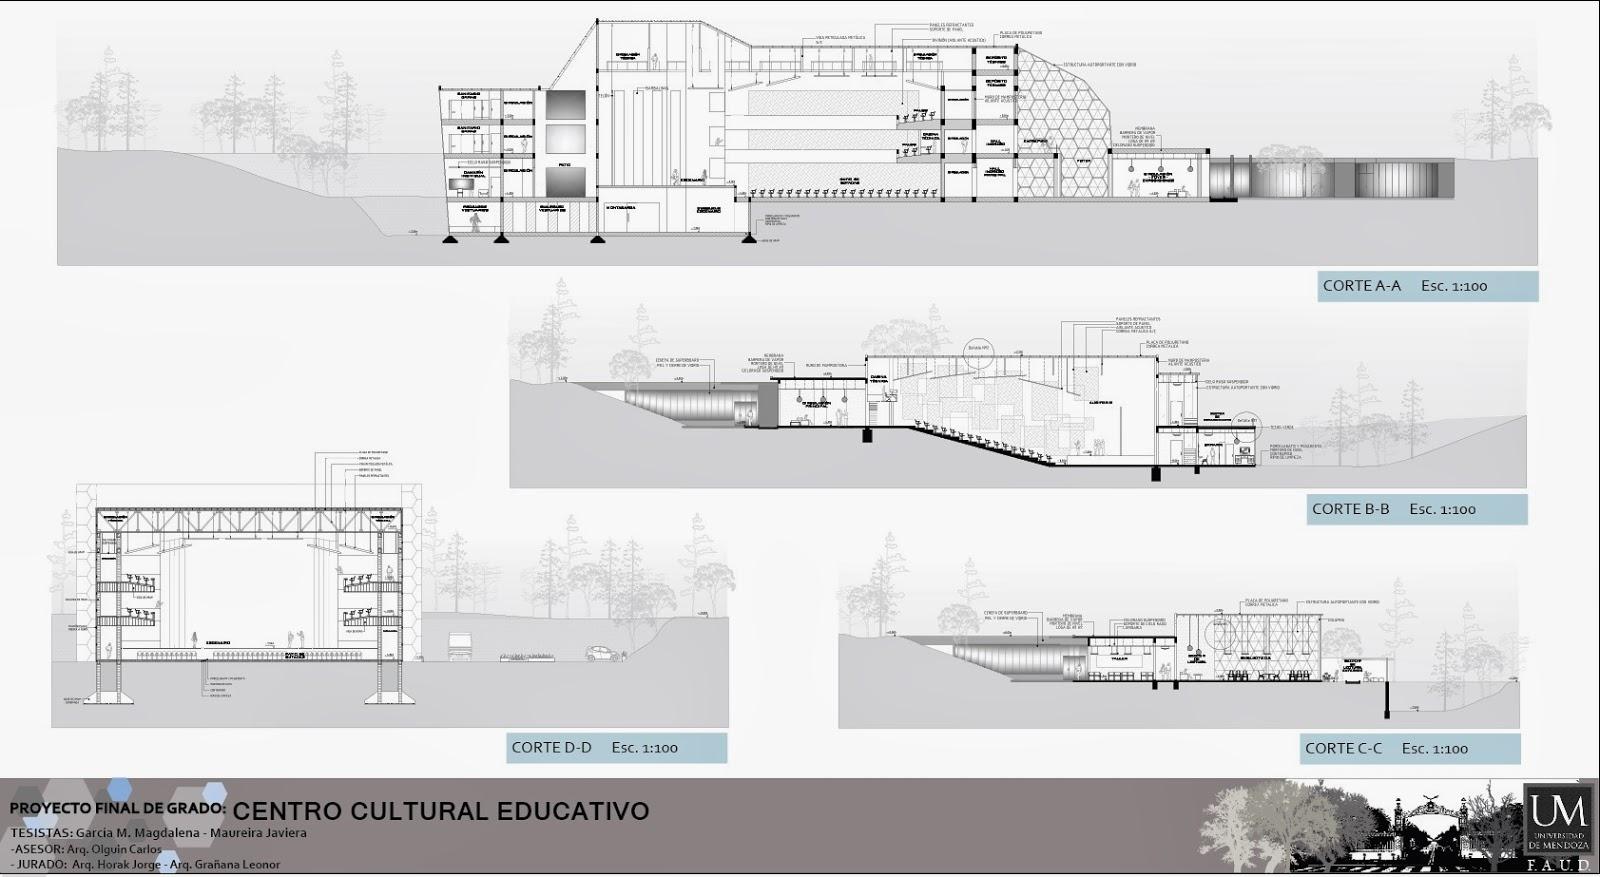 Arquitectura y dise o laminas tesis final de grado for Laminas arquitectura